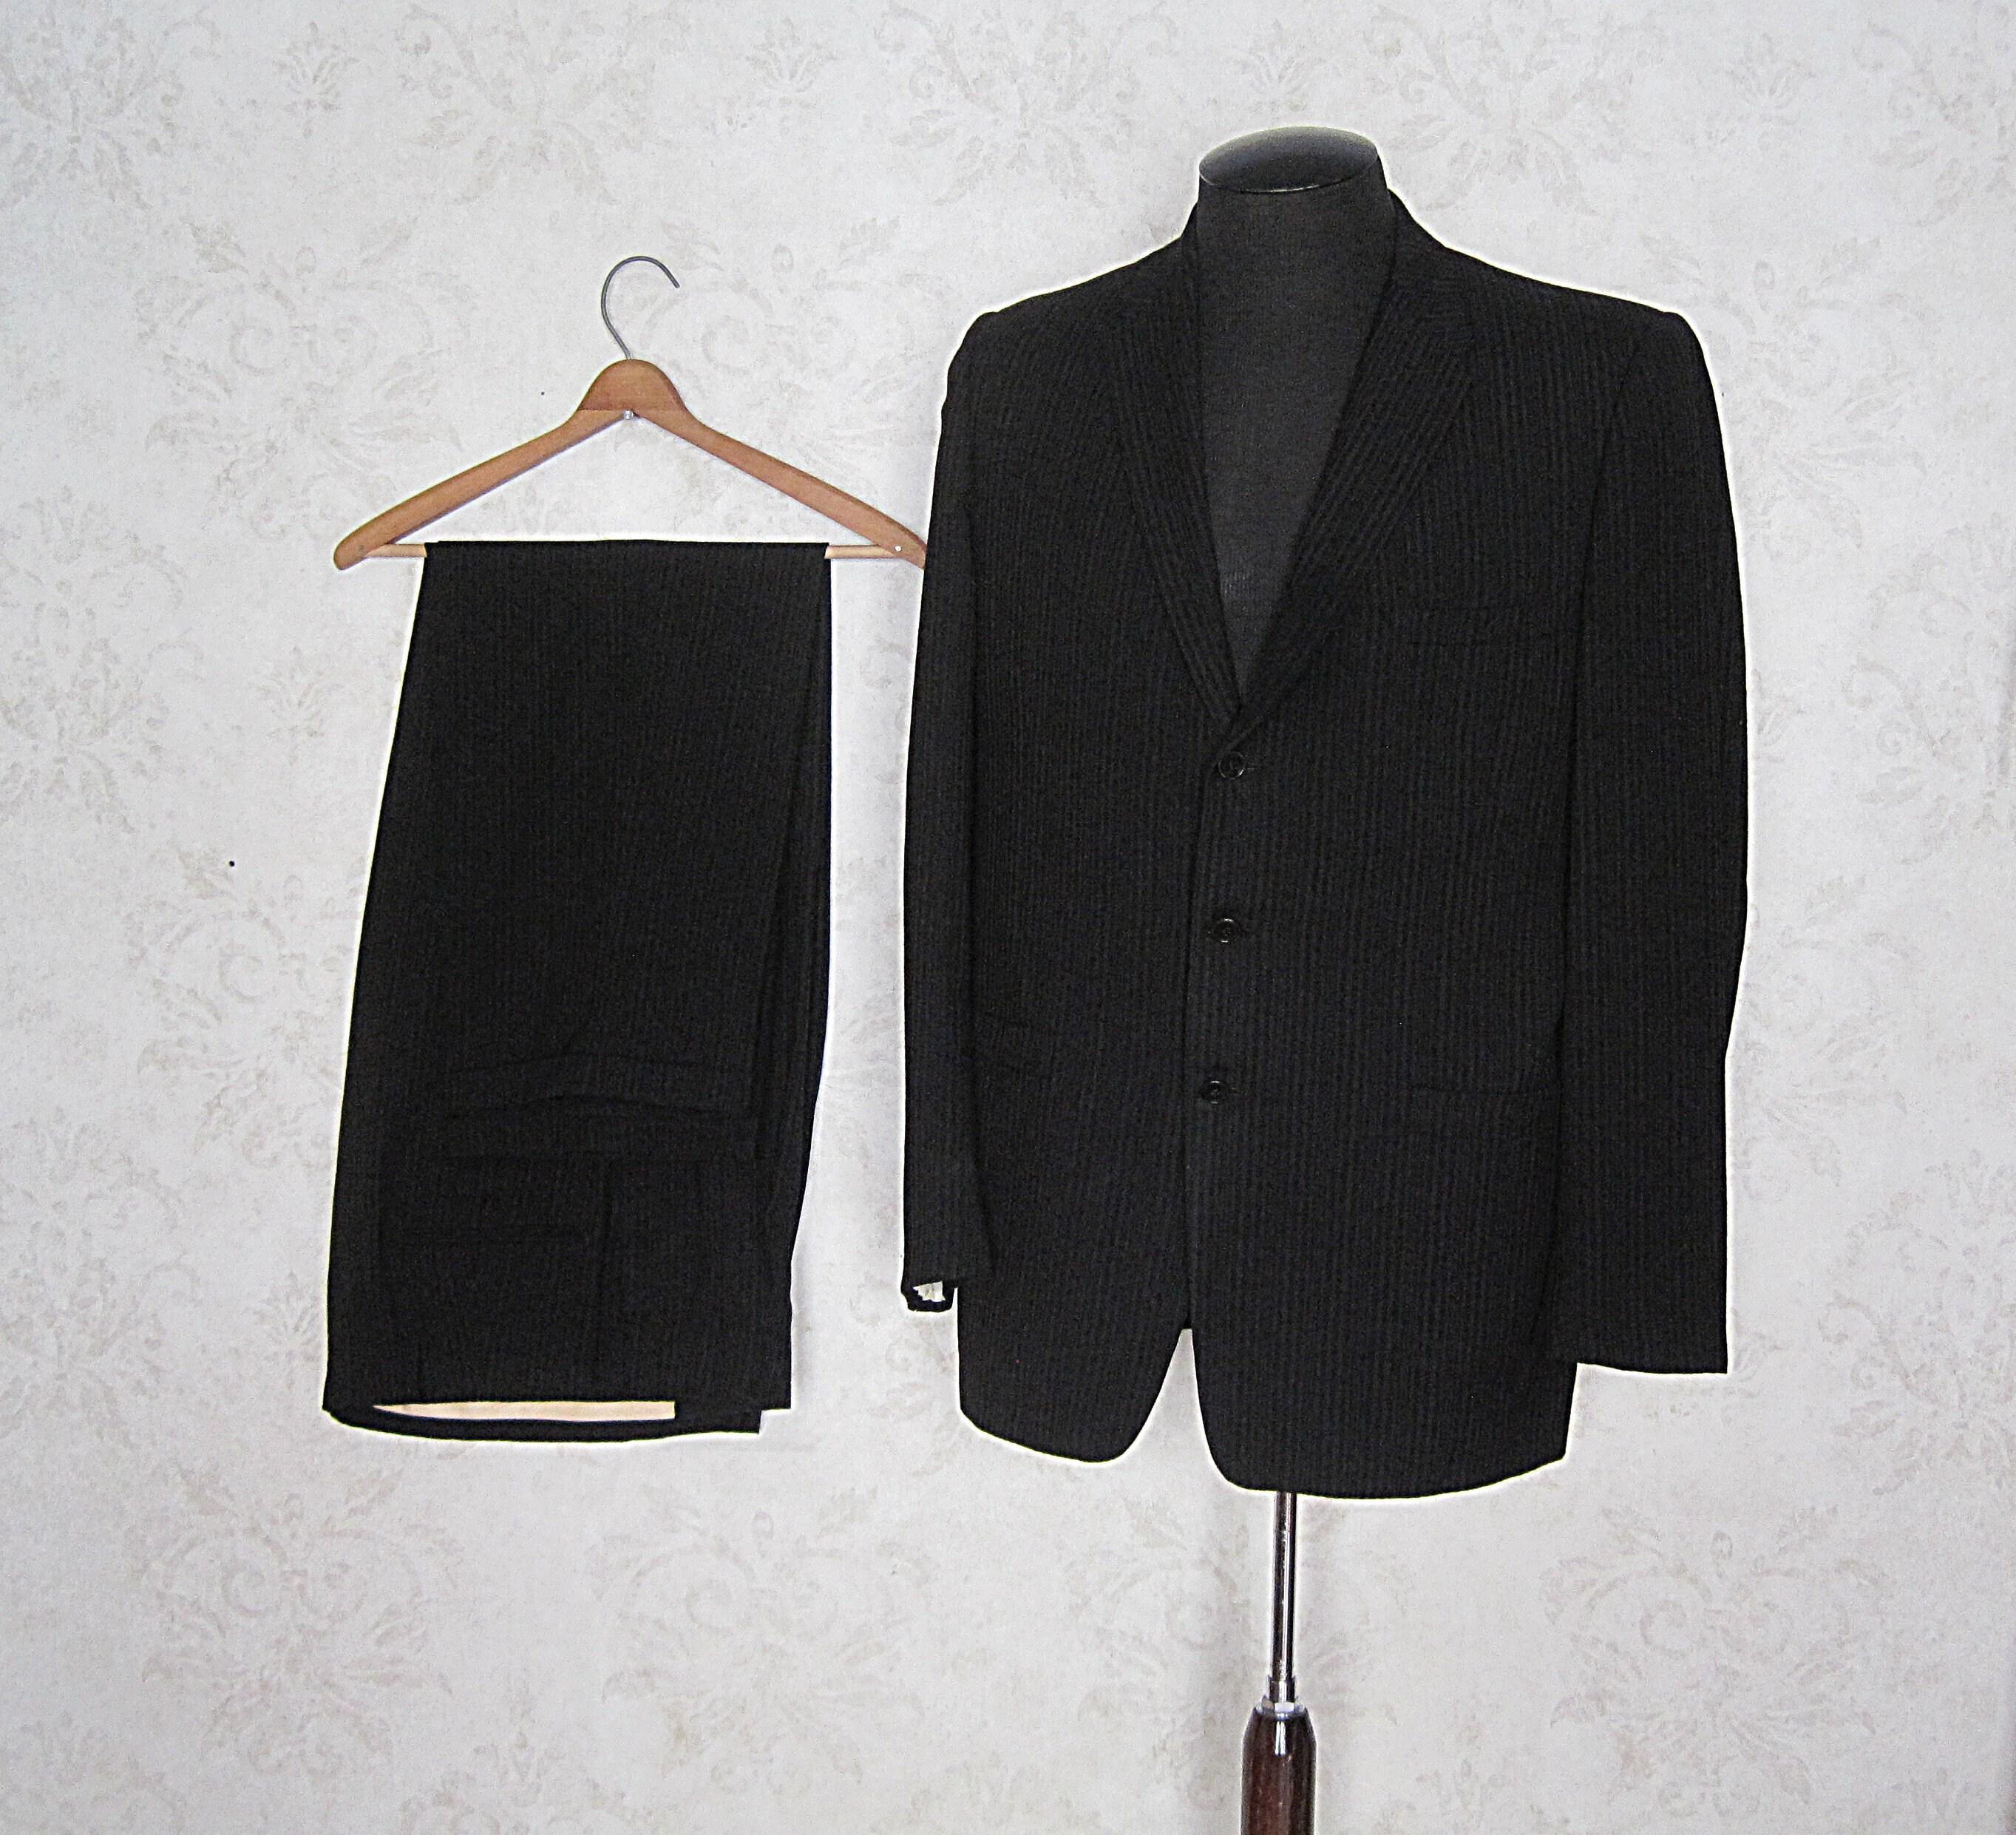 1960s – 70s Men's Ties | Skinny Ties, Slim Ties 1960S Vintage Pinstripe SuitHammonton Park Mens 50S 60S Three Button Pin Stripe 44 X 34 $188.00 AT vintagedancer.com